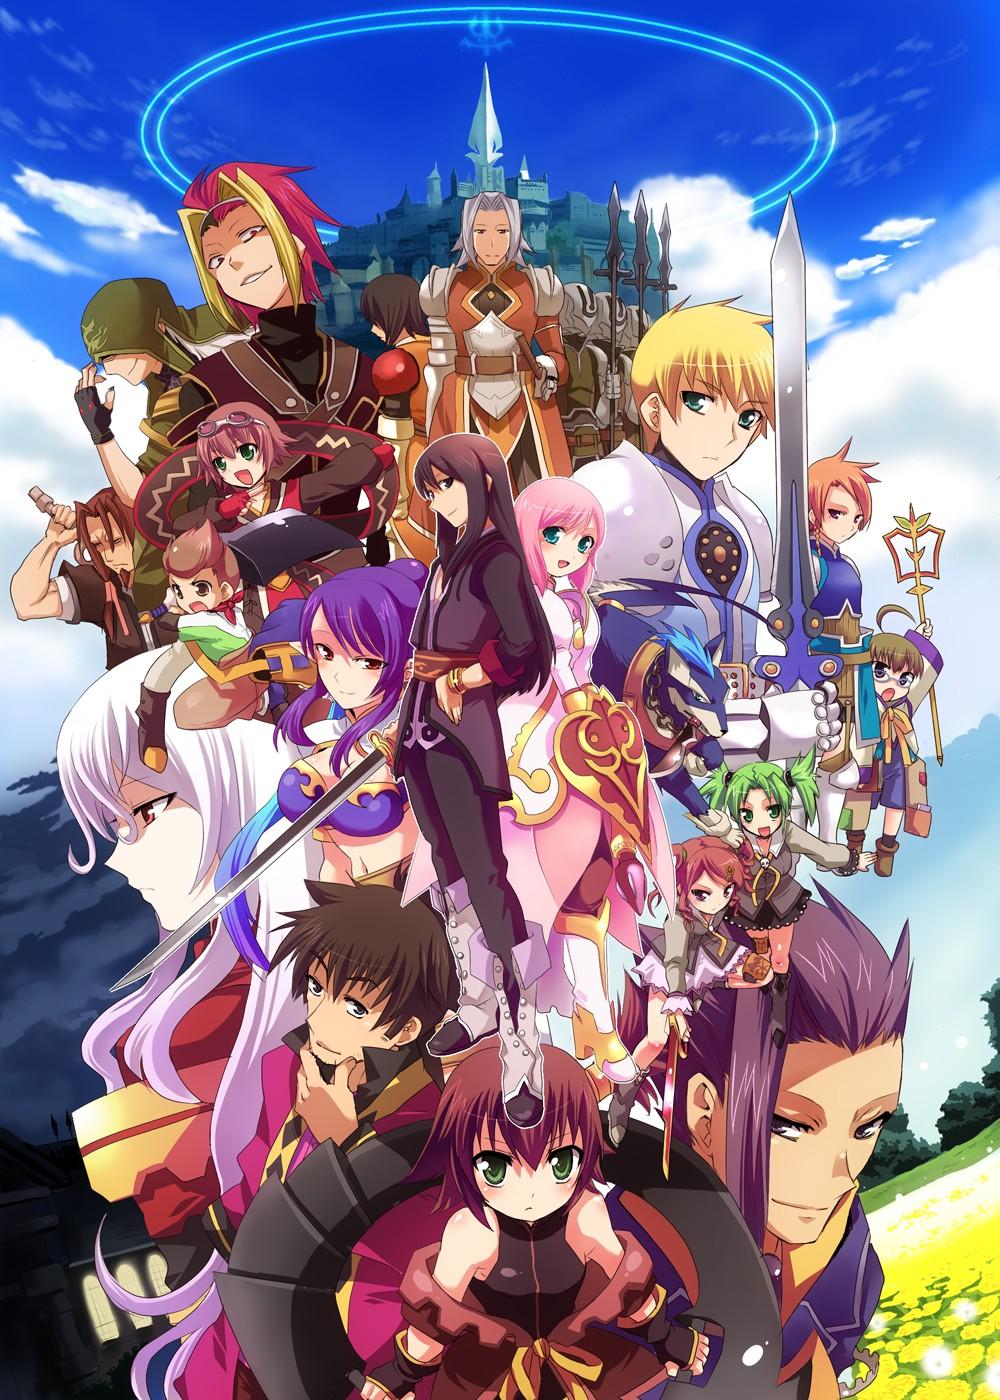 Free Download Desktop Wallpaper Tales Of Vesperia H609990 Games Hd